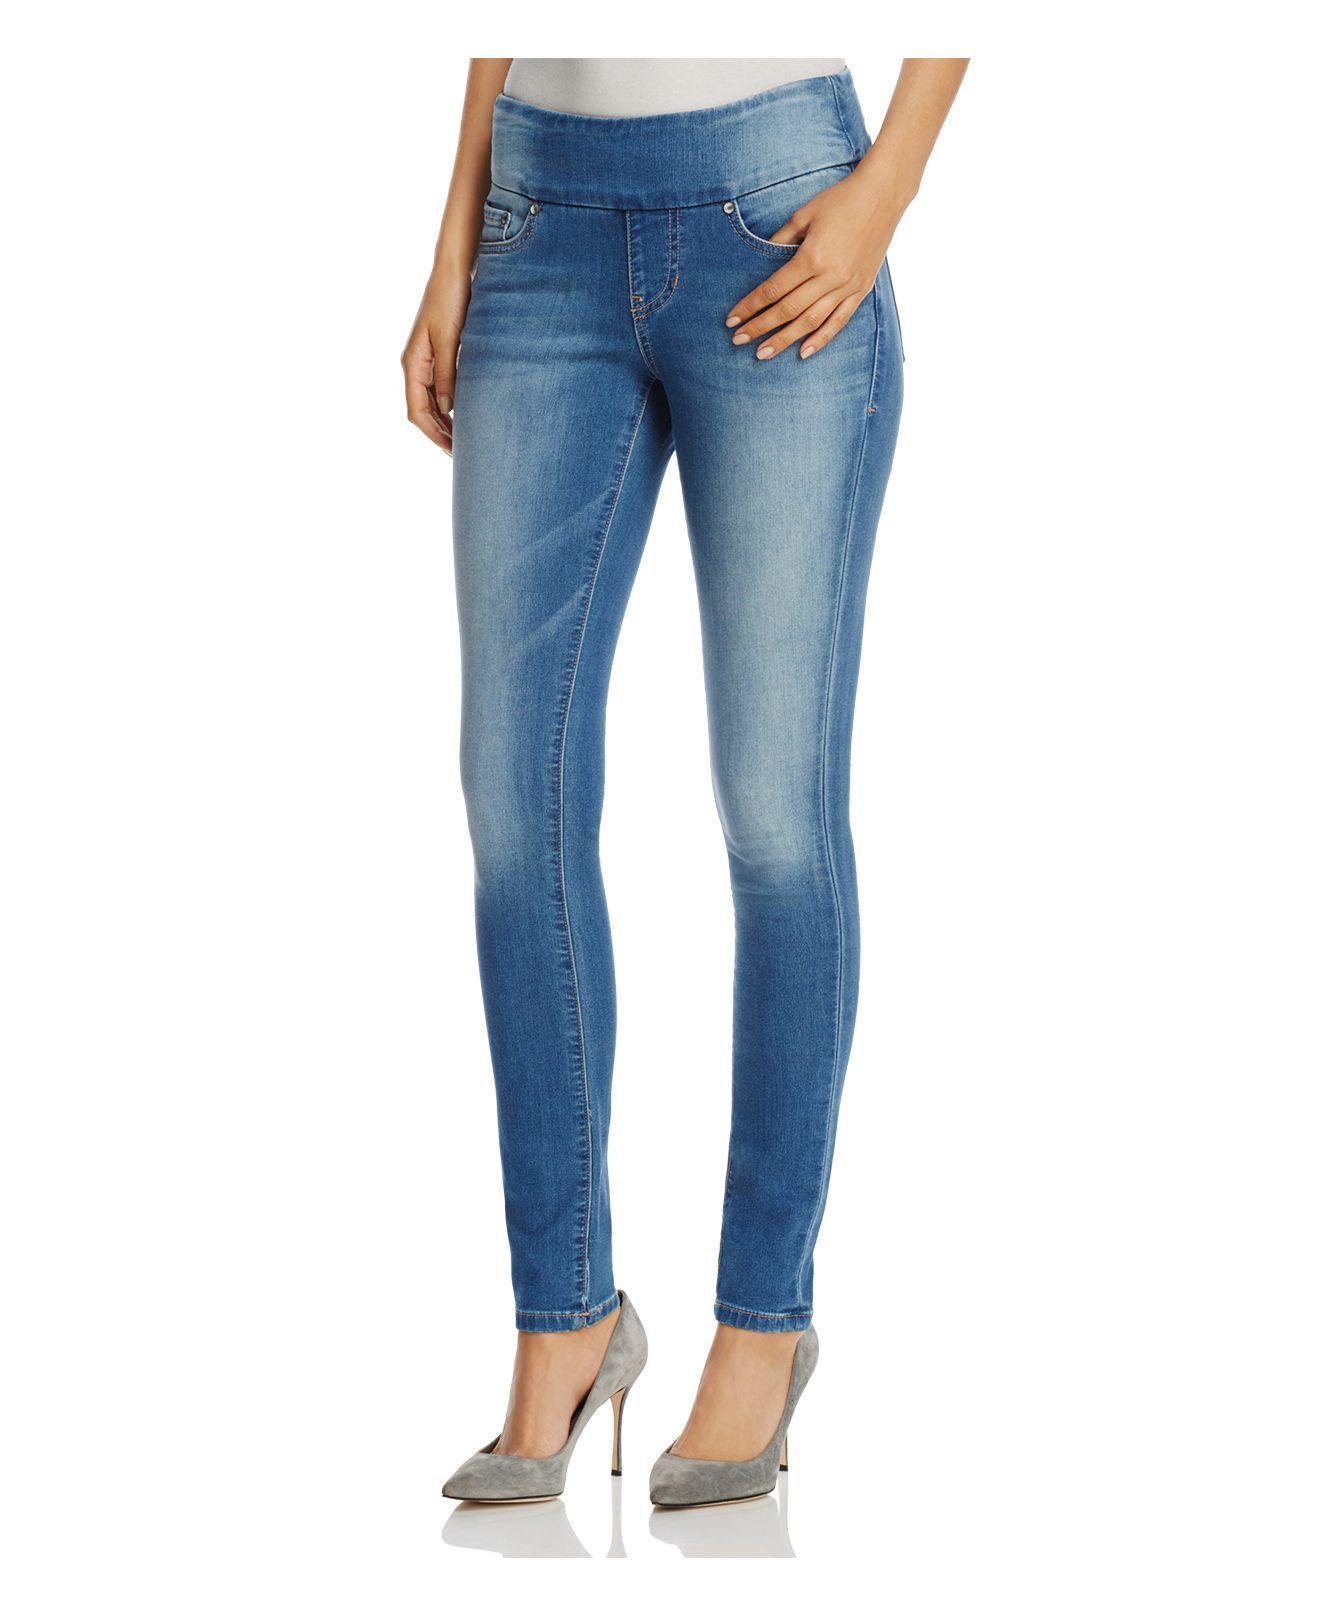 Balmain Jeans Women